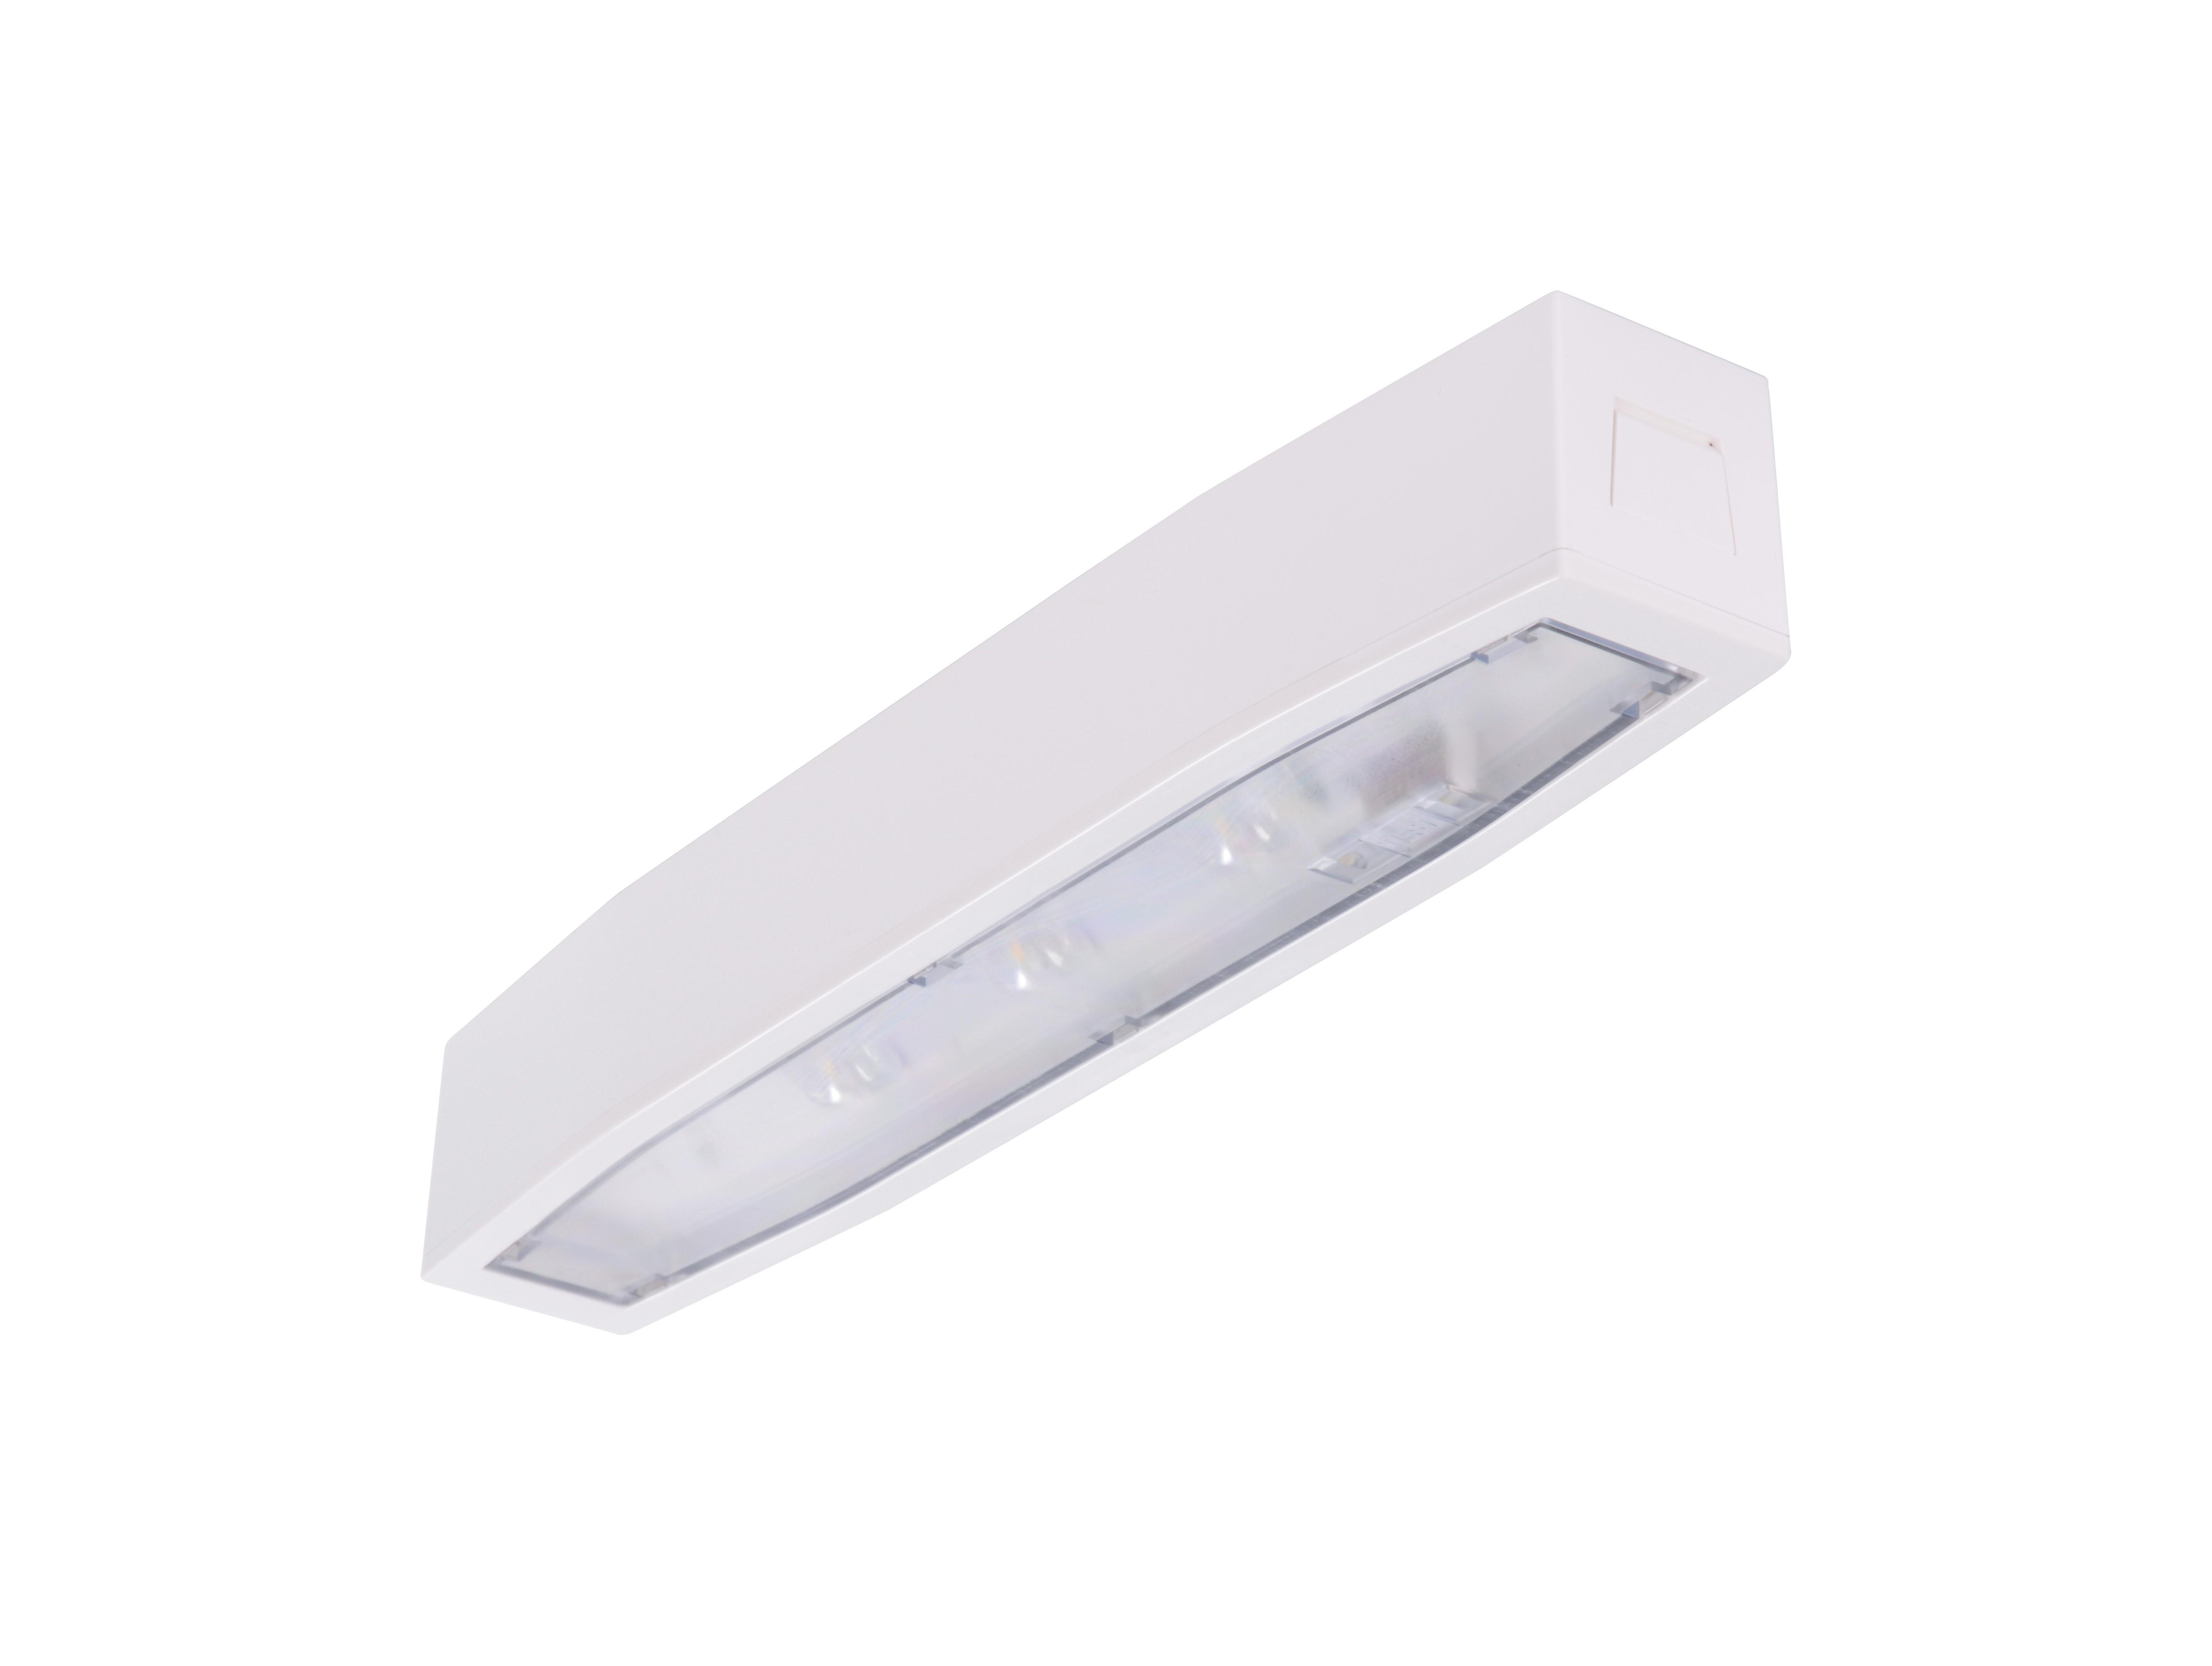 Lampa antipanica led Intelight 94658   3h mentinut test automat 0